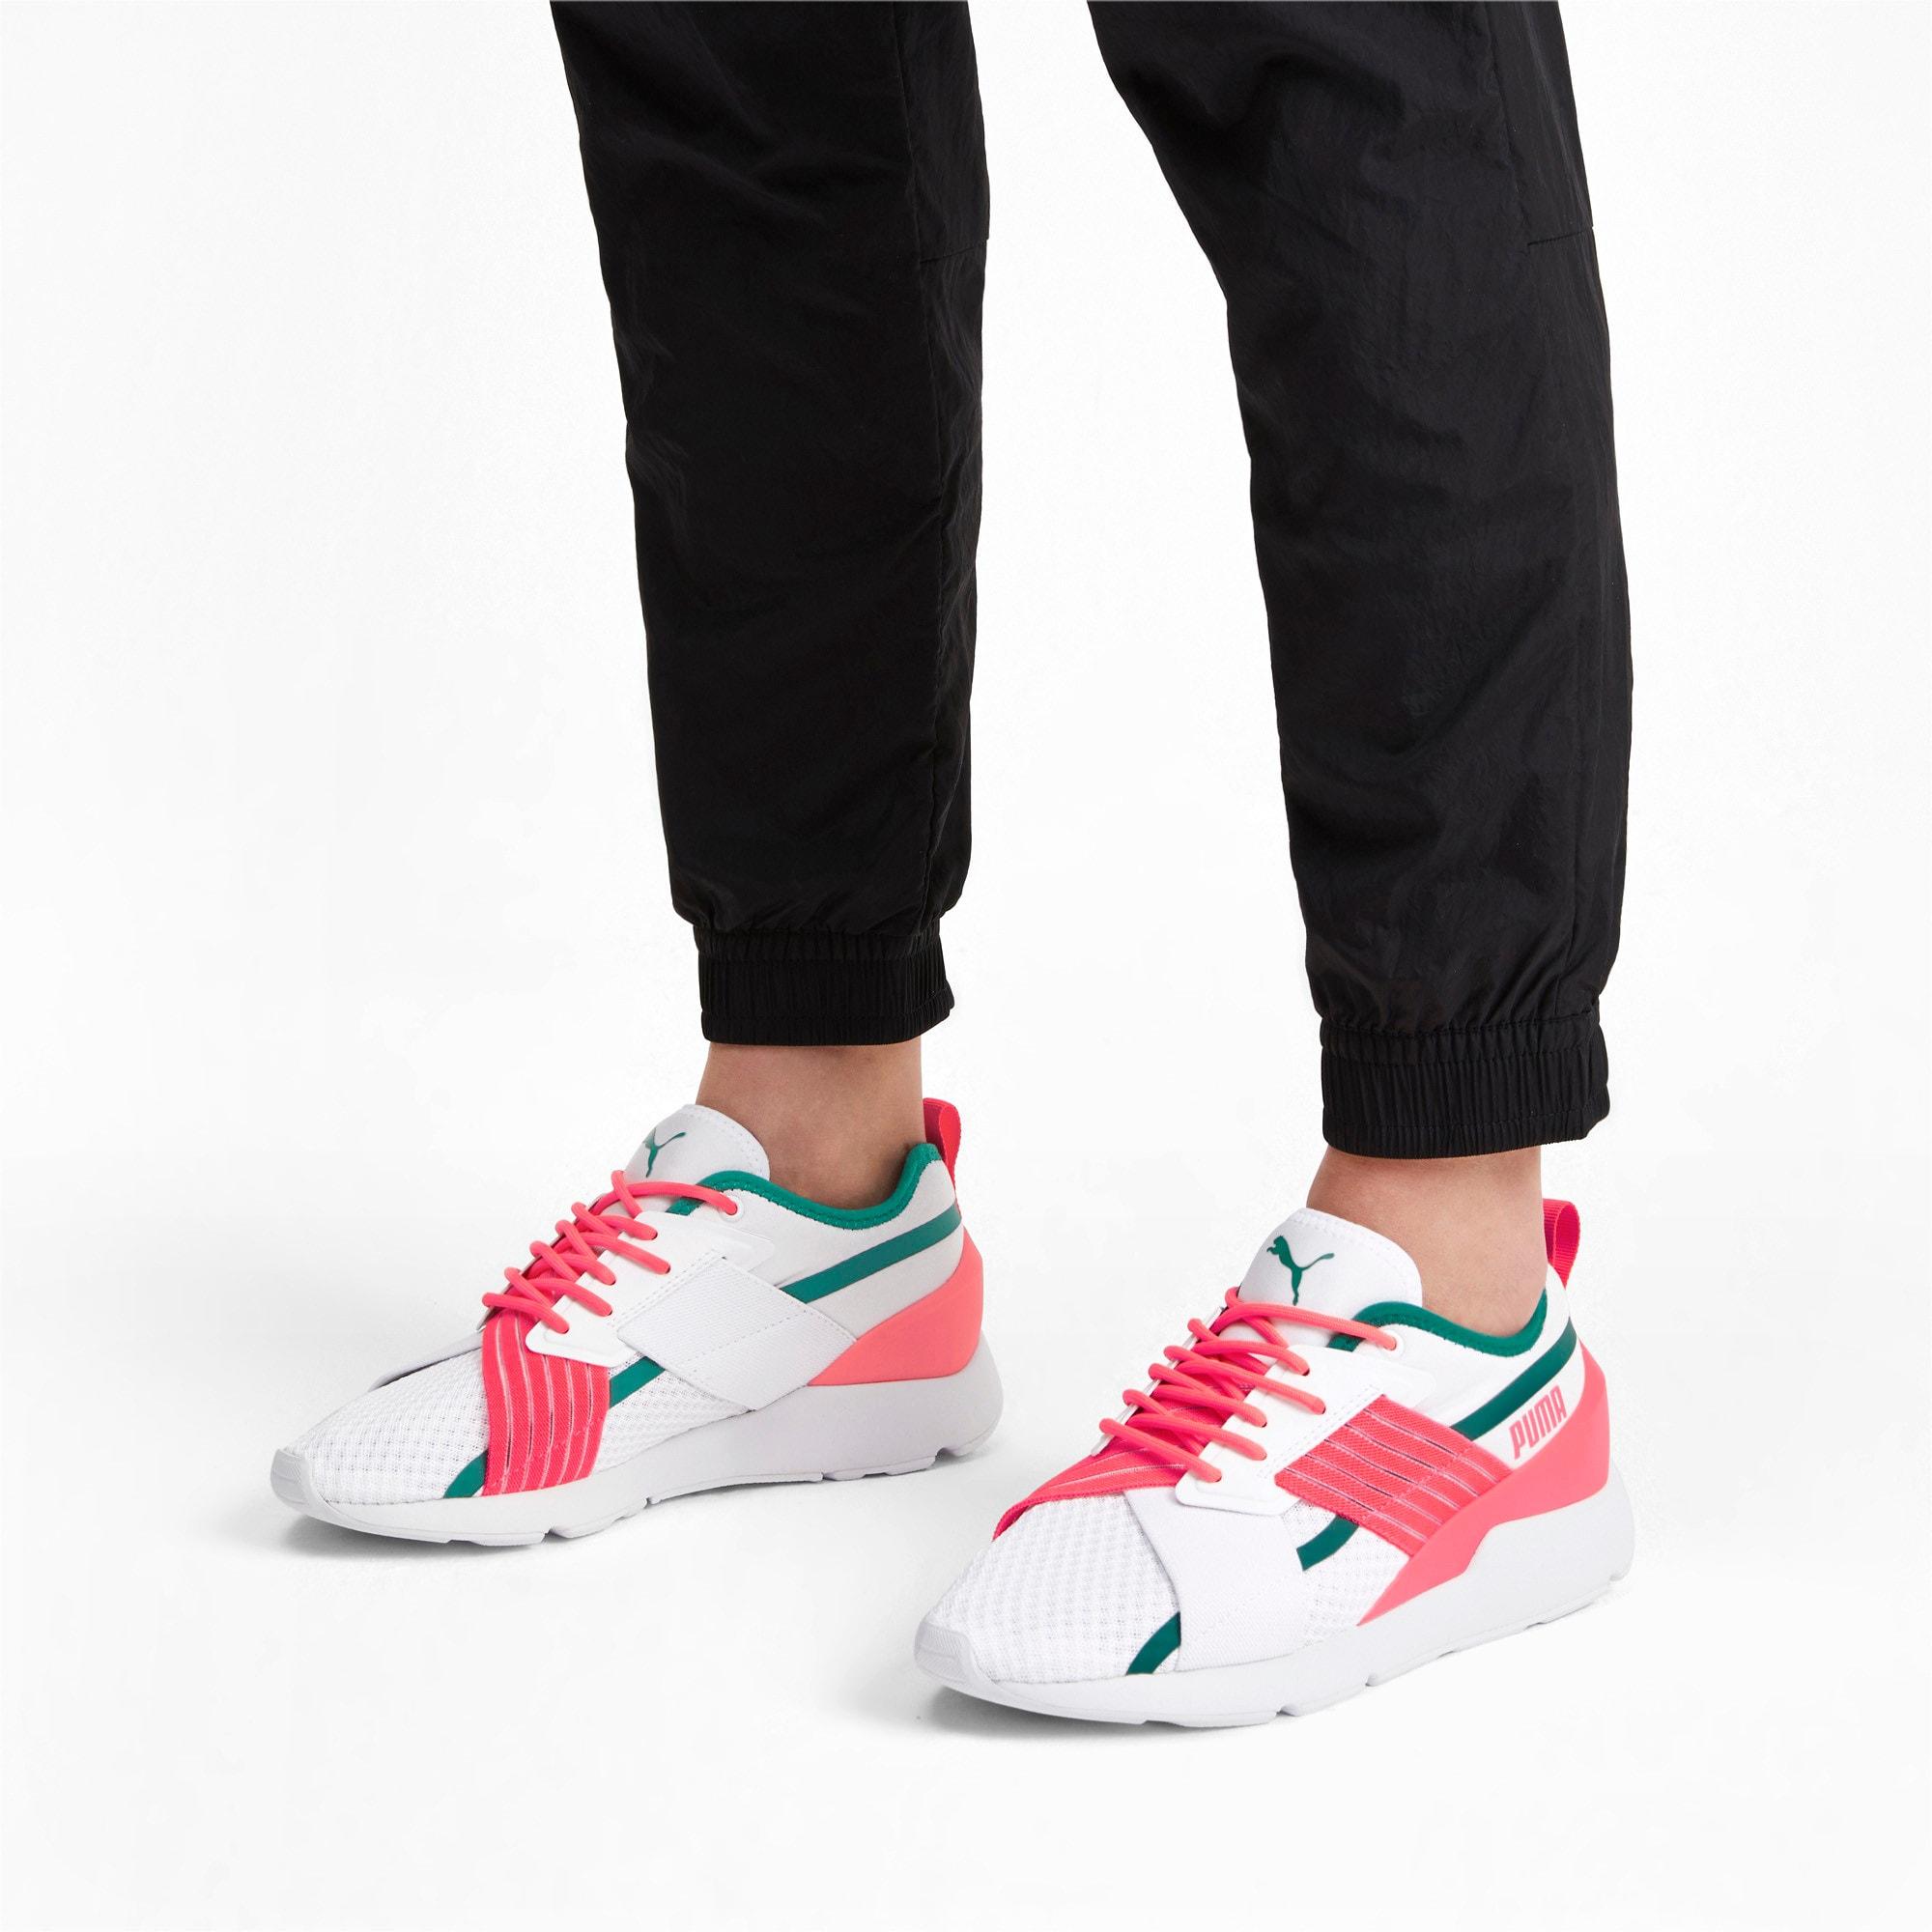 Thumbnail 2 of Muse X-2 Women's Sneakers, Puma White-Pink Alert, medium